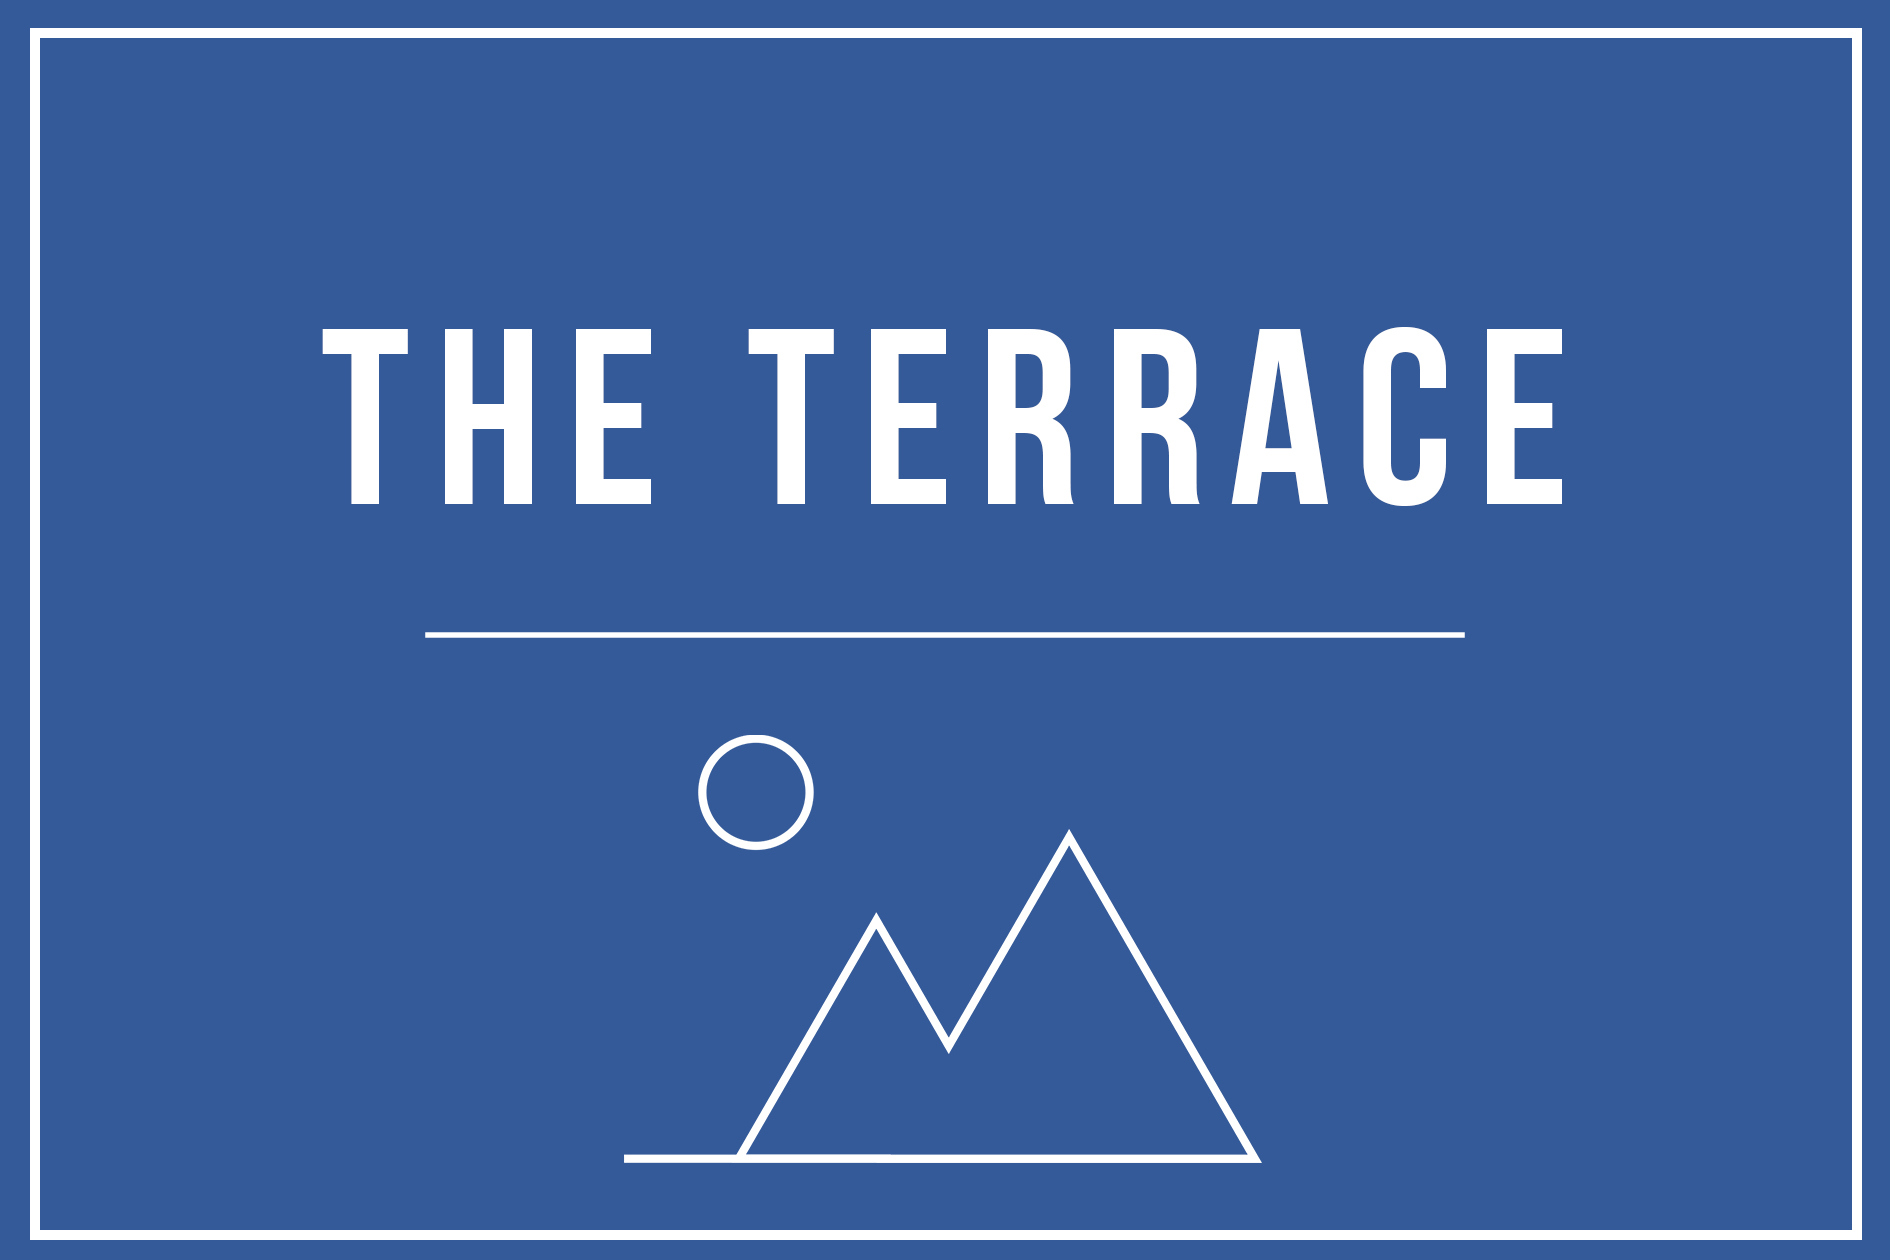 aya-kapadokya-terrace-header-0001